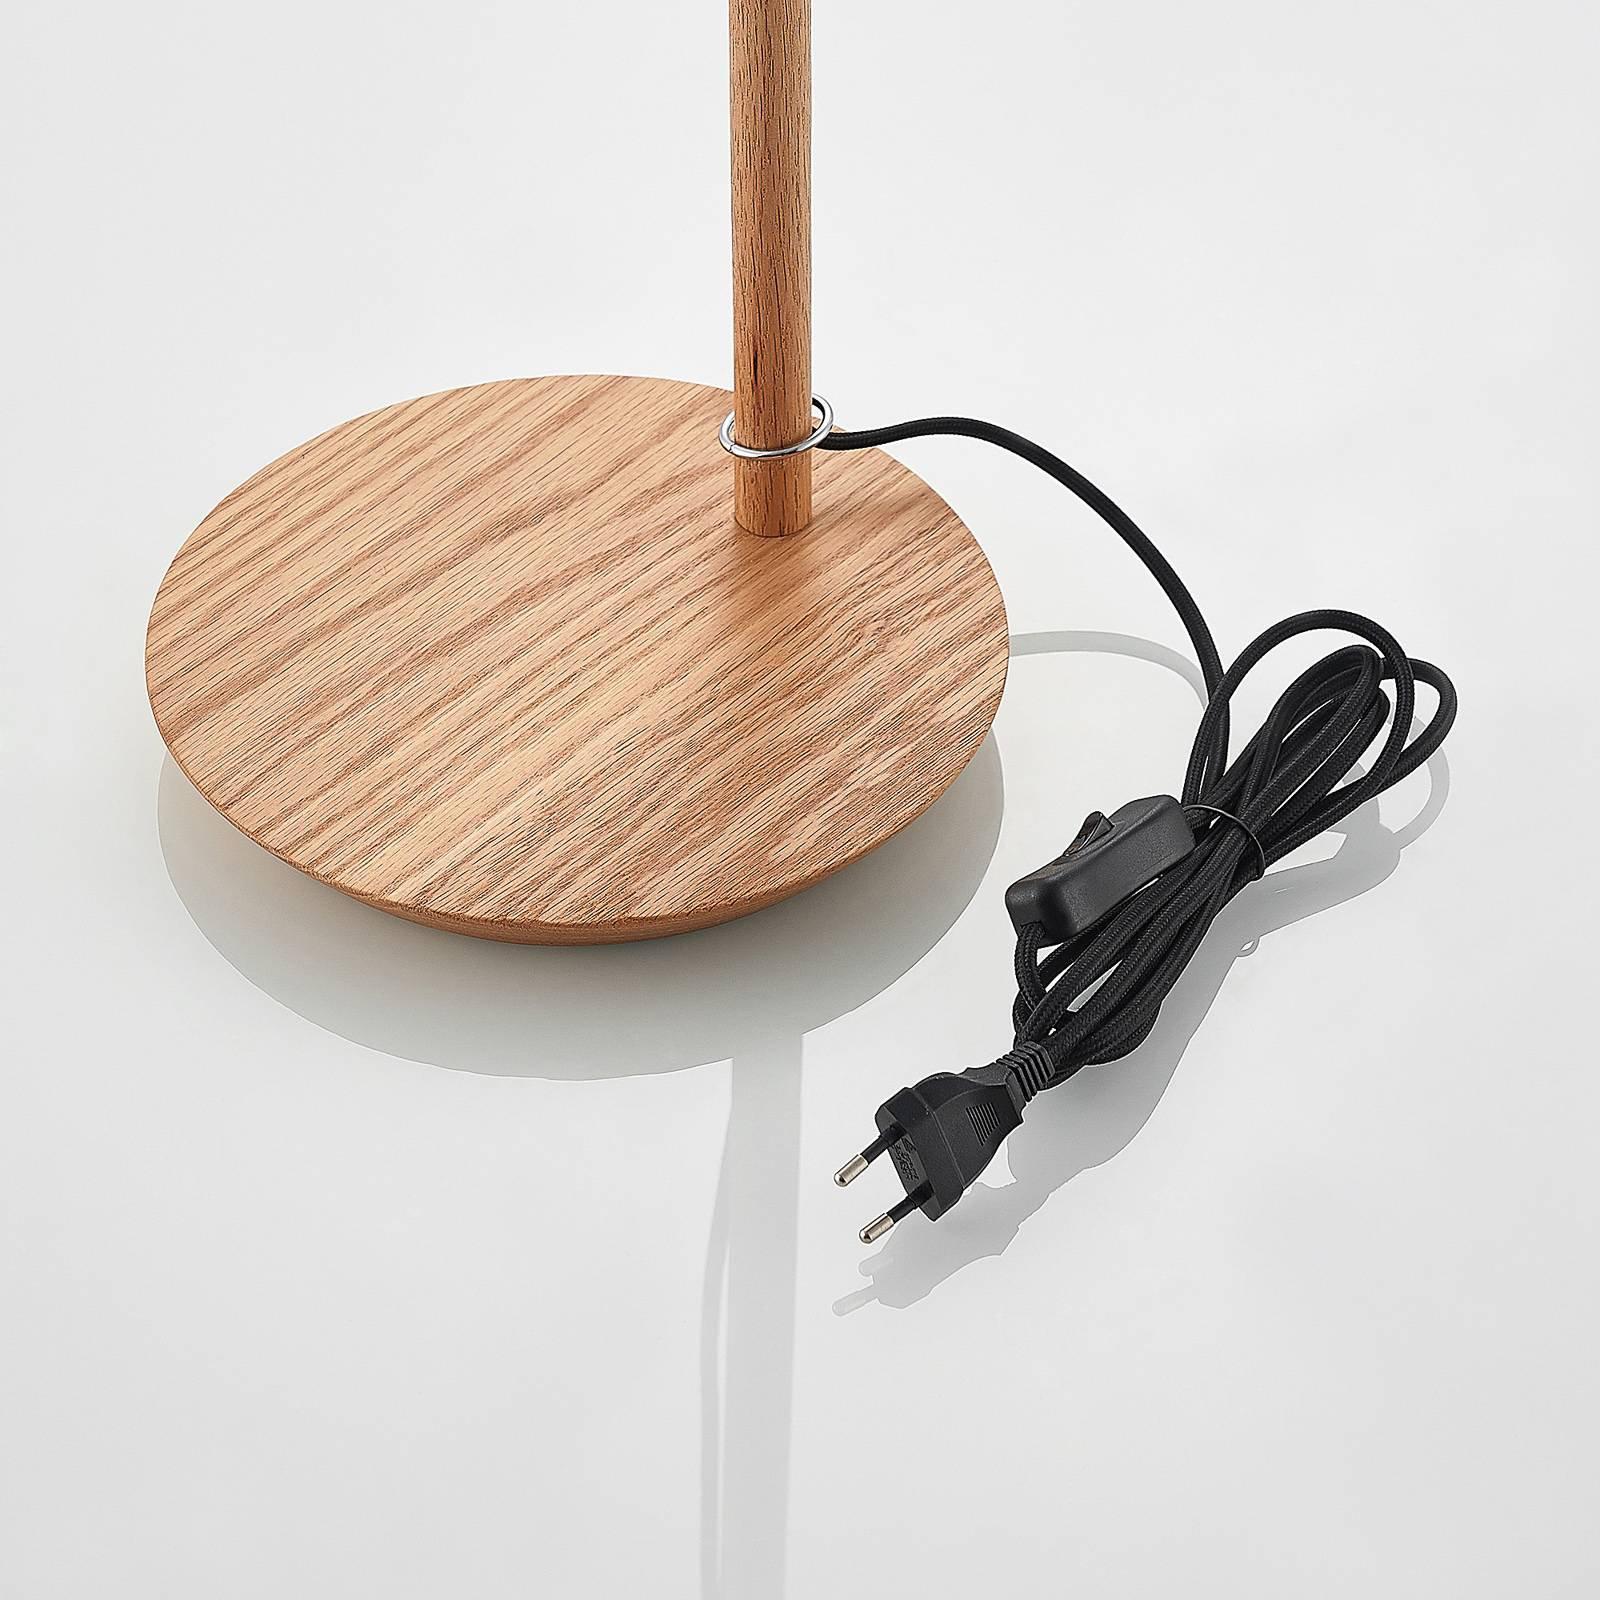 Lucande Jinda bordlampe, trestamme, blått stoff